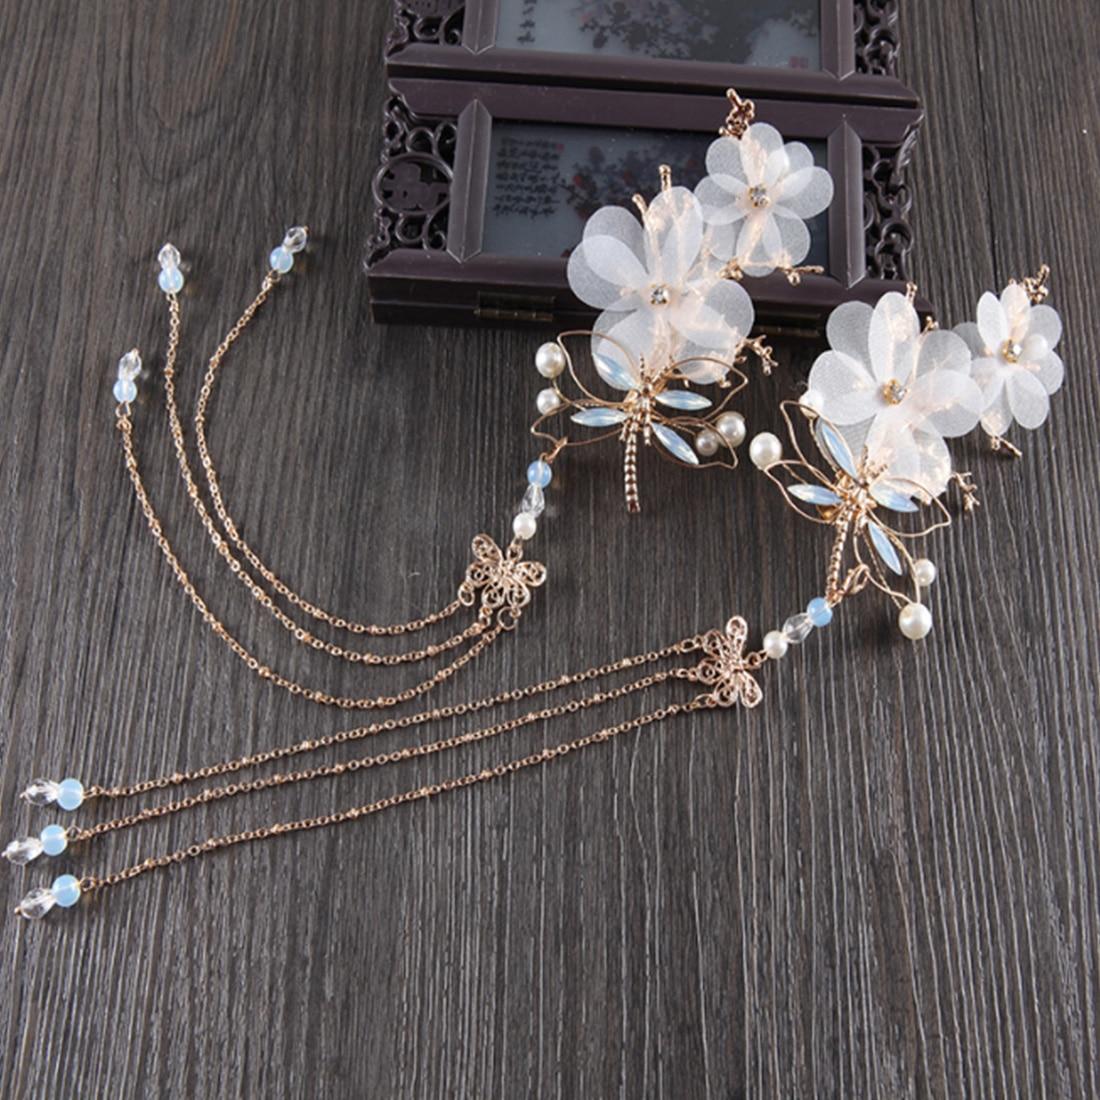 Artesanía nupcial borla regalo Hada antigua Floral chino horquilla lateral Clip tocado elegante hecho a mano libélula Decoración